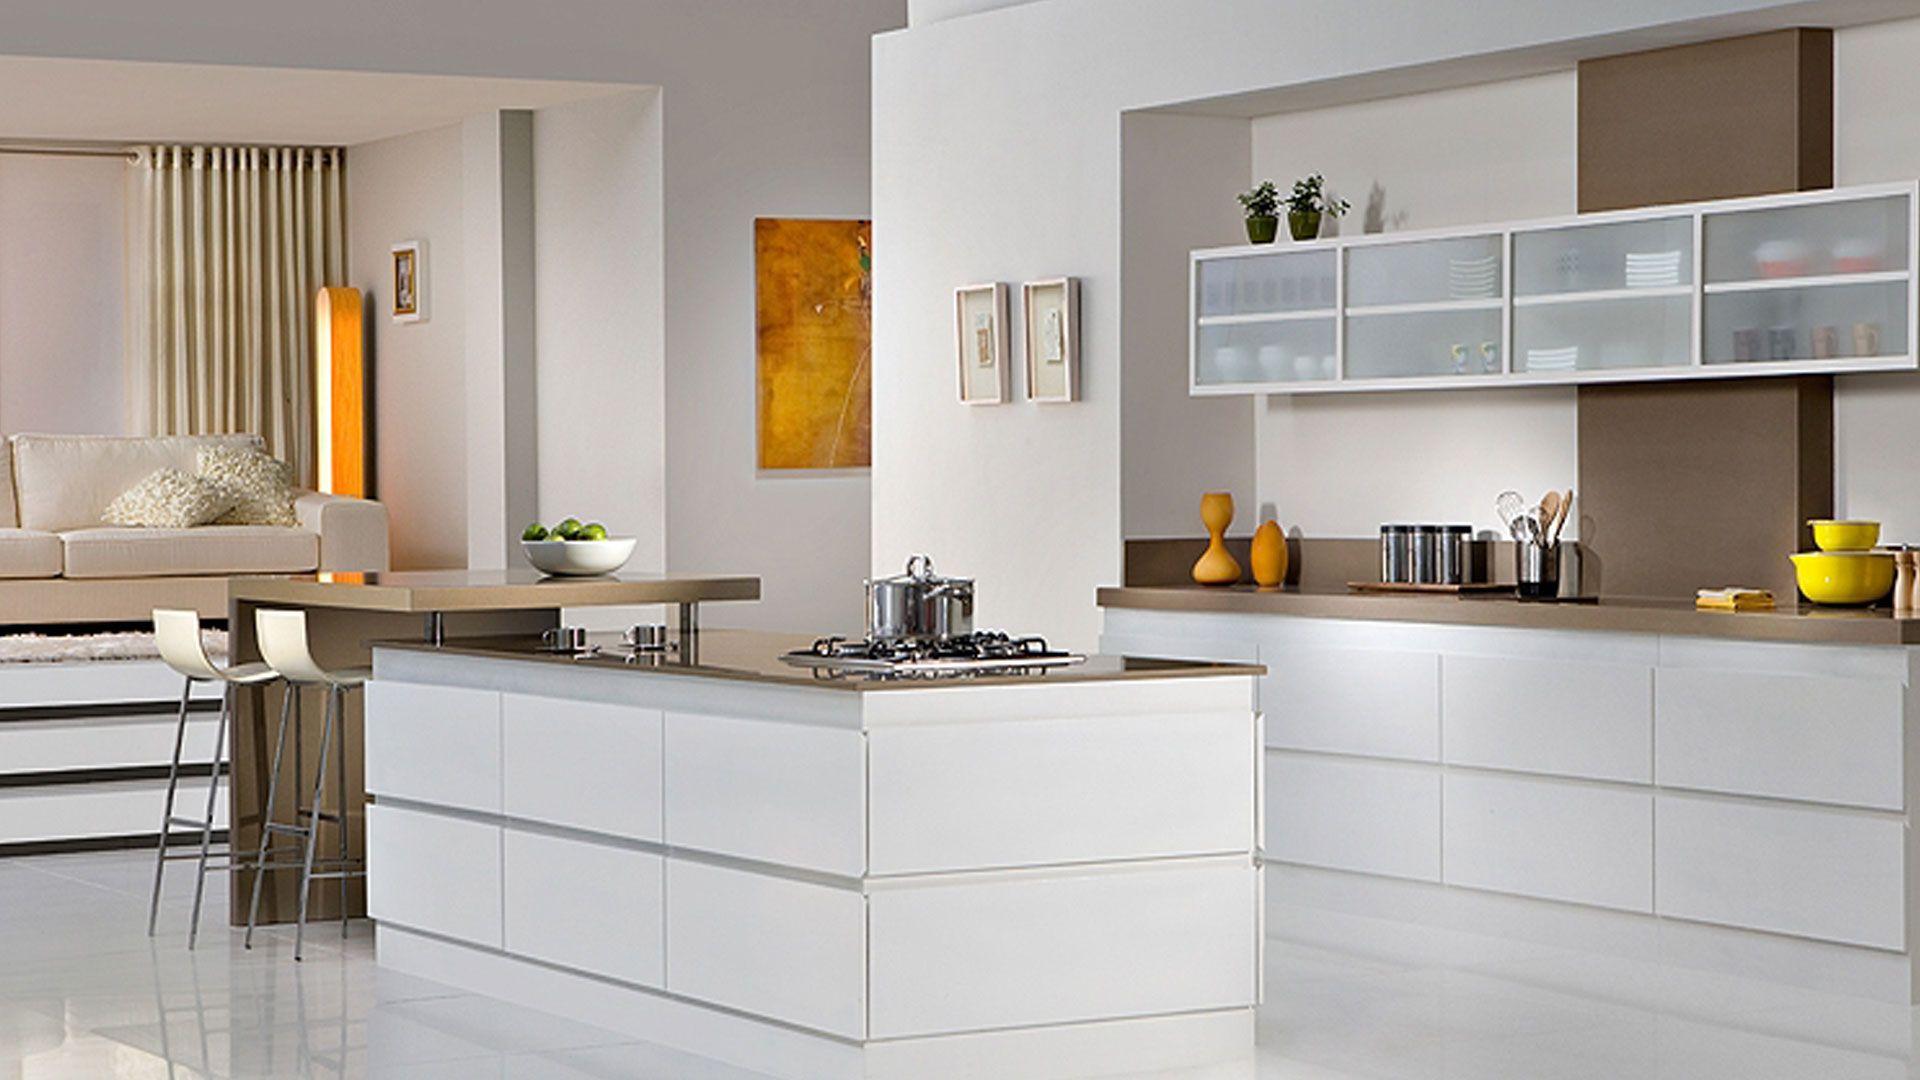 Full Size of Küche Mit Kochinsel Billig Küche Klein Billig Wasserhahn Küche Billig Küche Billig Kaufen Küche Küche Billig